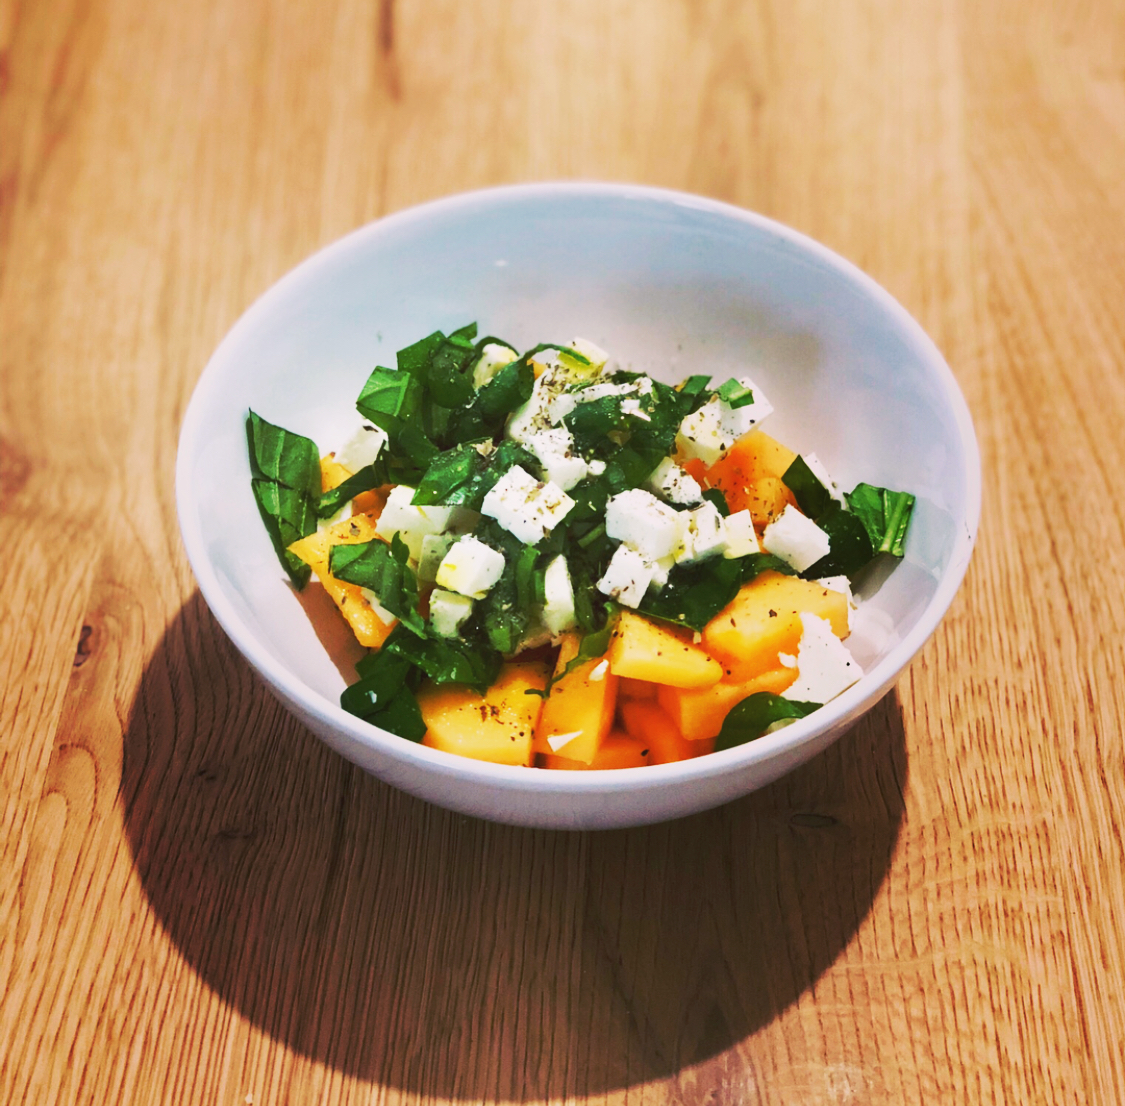 Ricetta Insalata Vegetariana.Insalata Di Melone Feta E Basilico Ricetta Vegetariana E Gluten Free Paccheri A Merenda